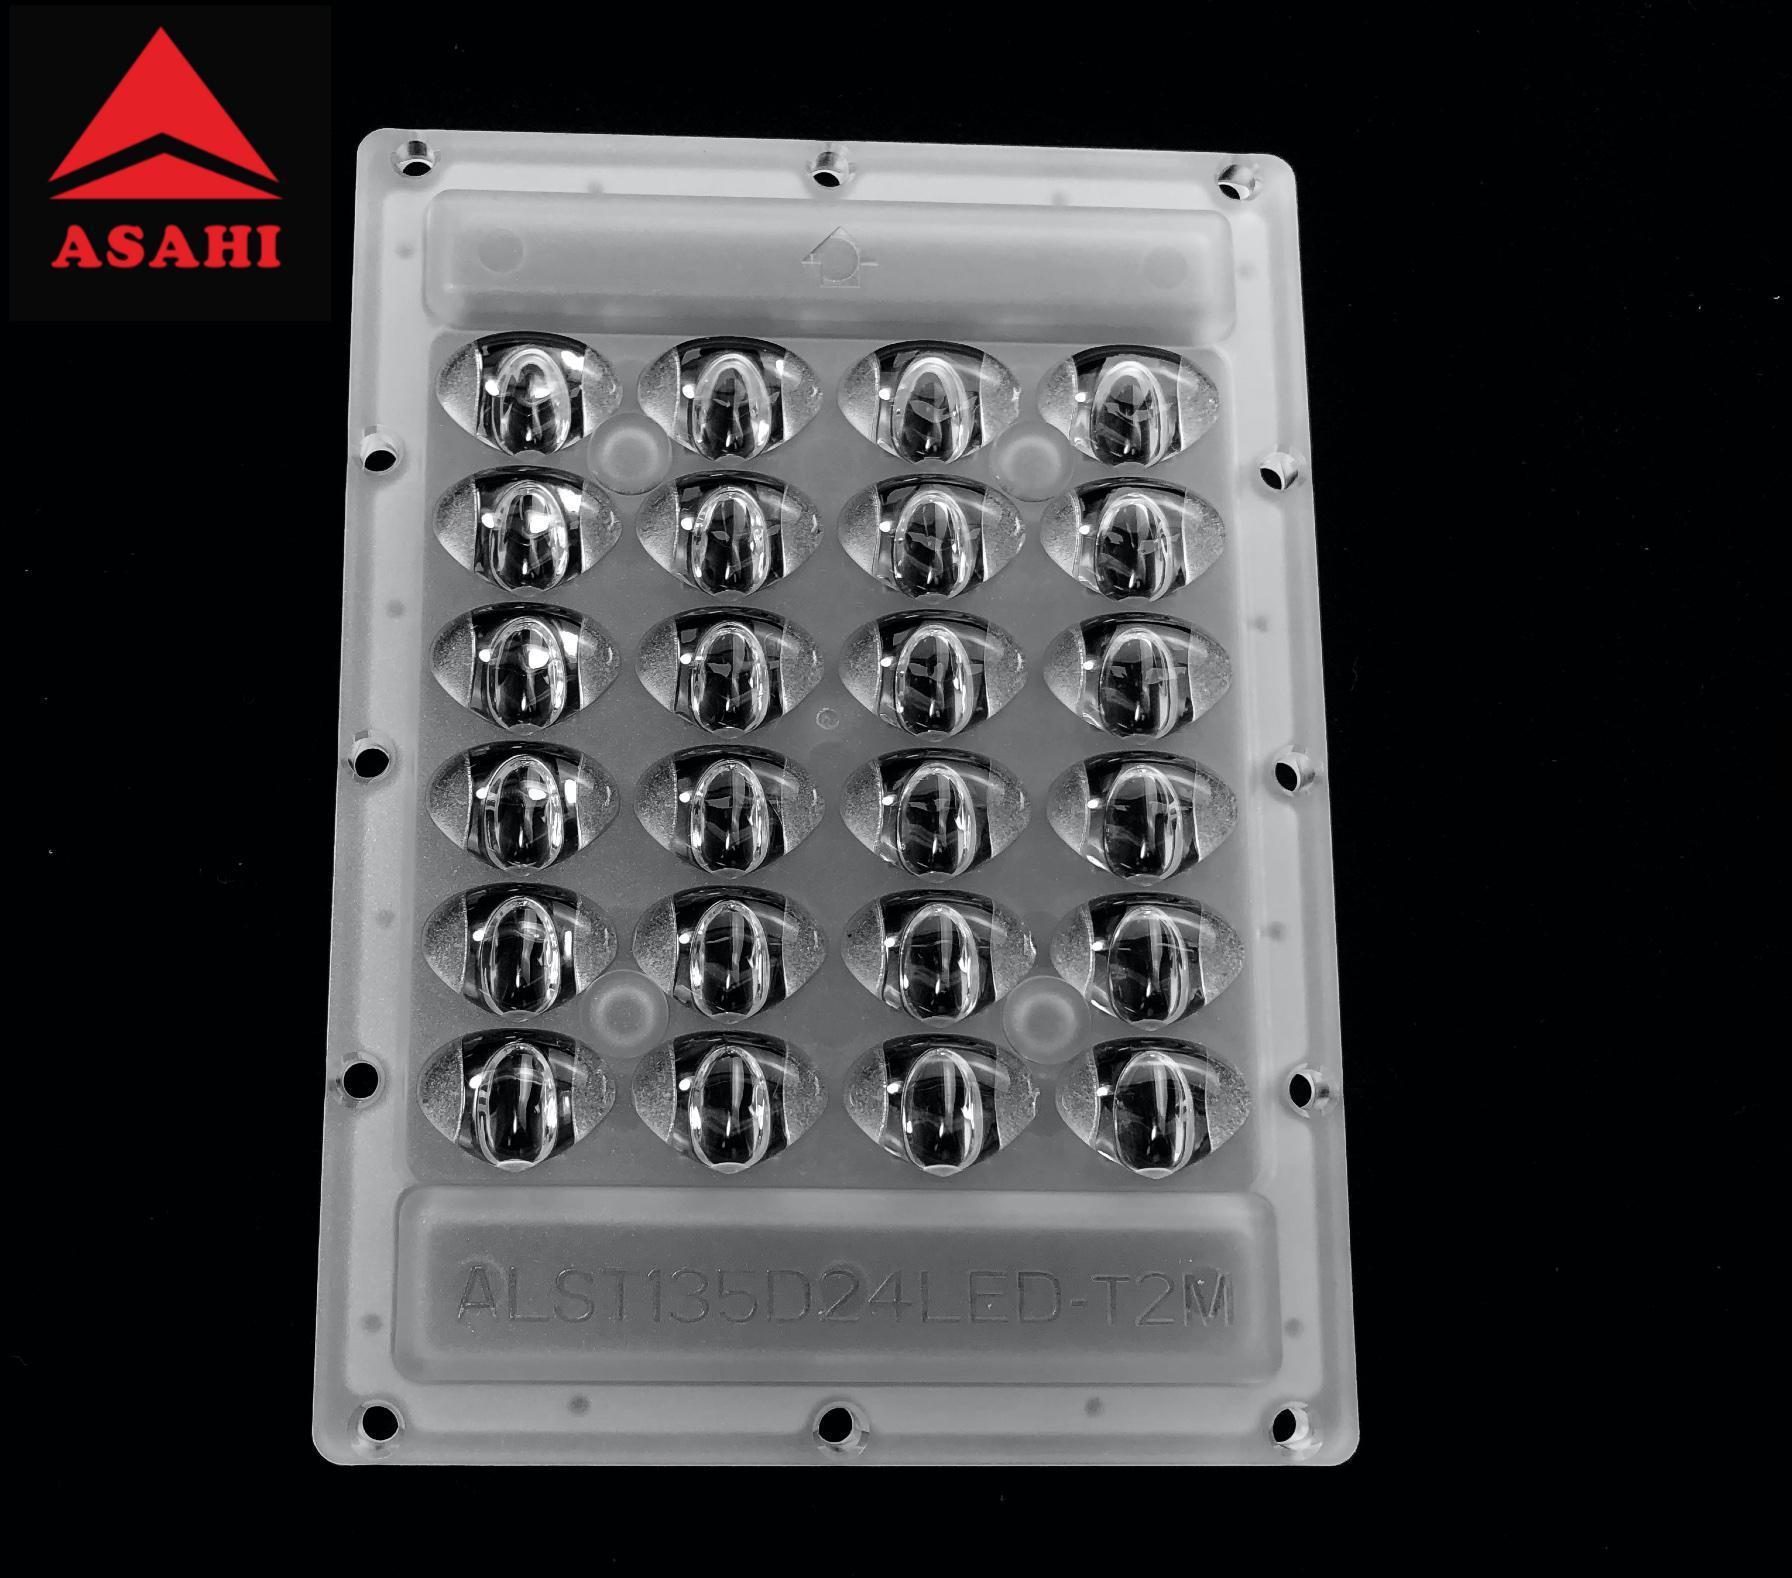 High-performance street lighting 4x6 optical led lens ALST135D24LEDT2M-cutoff 1